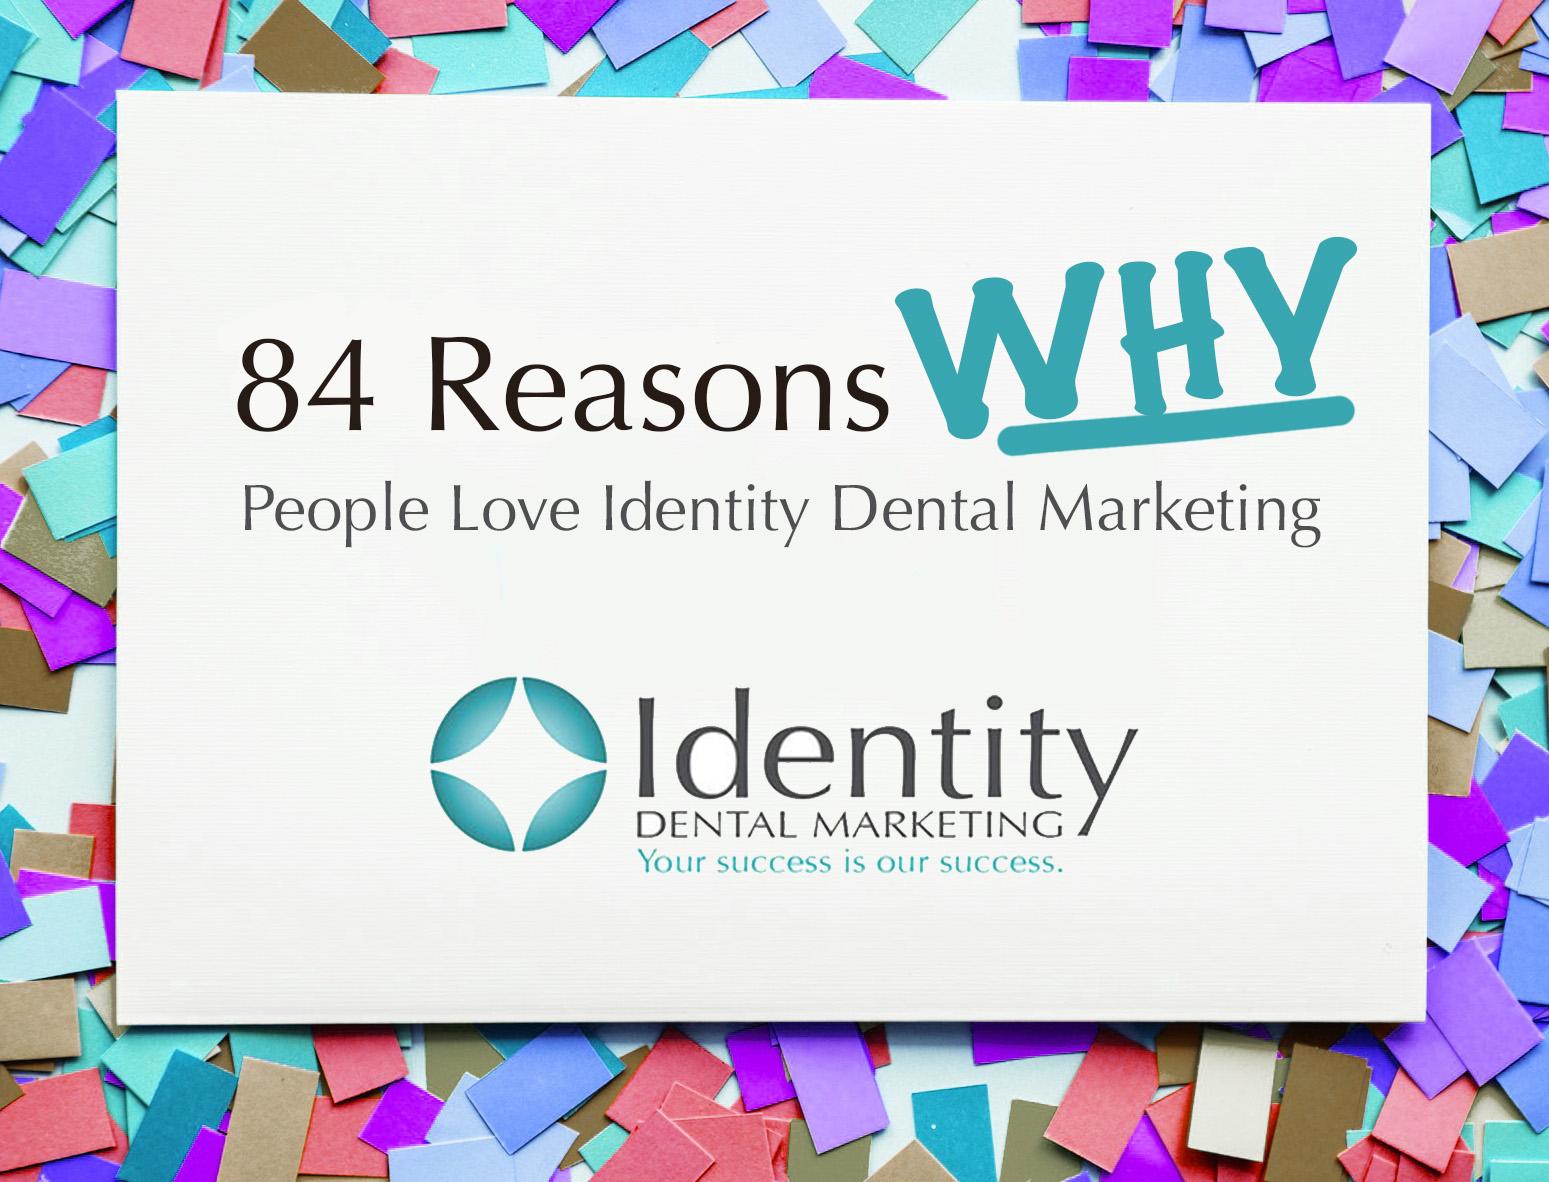 Ethical Dental Marketing Company